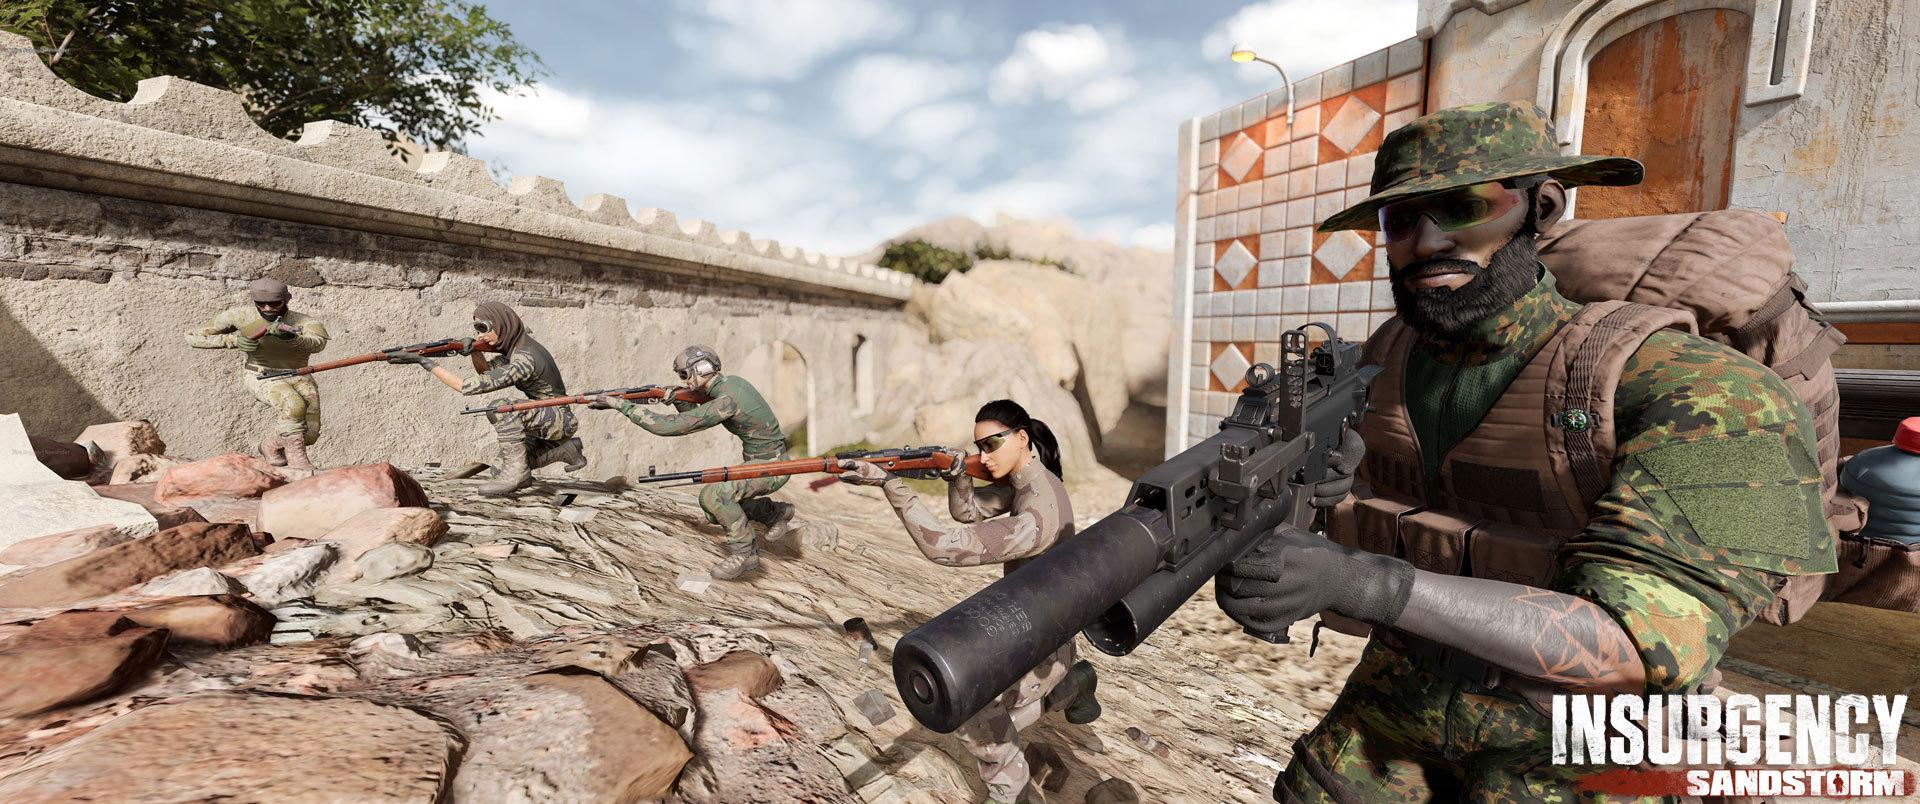 Insurgency: Sandstorm :: Community Update #2: New Game Mode